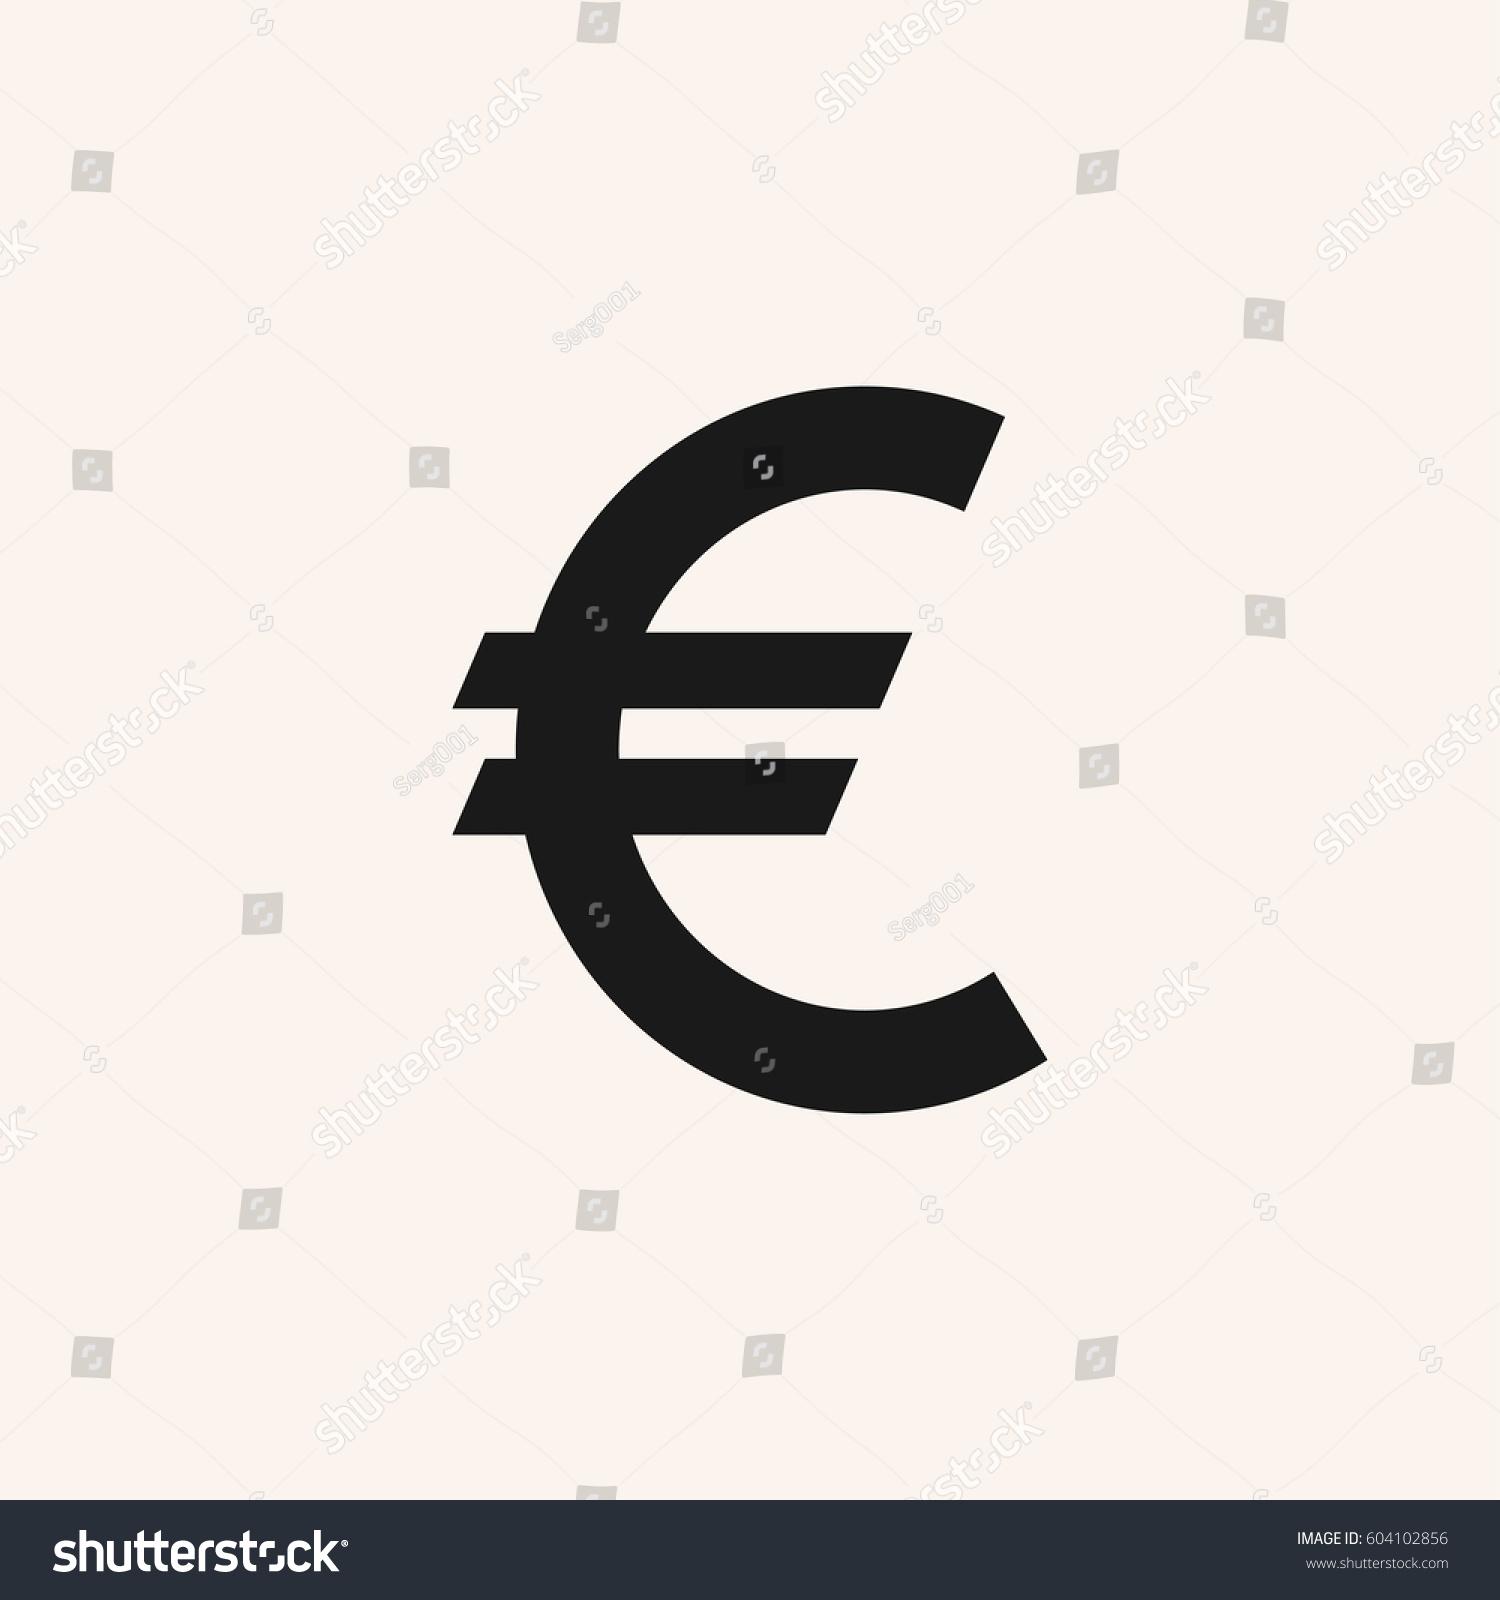 Euro sign vector icon euro currency stock vector 604102856 euro sign vector icon euro currency symbol eur buycottarizona Choice Image